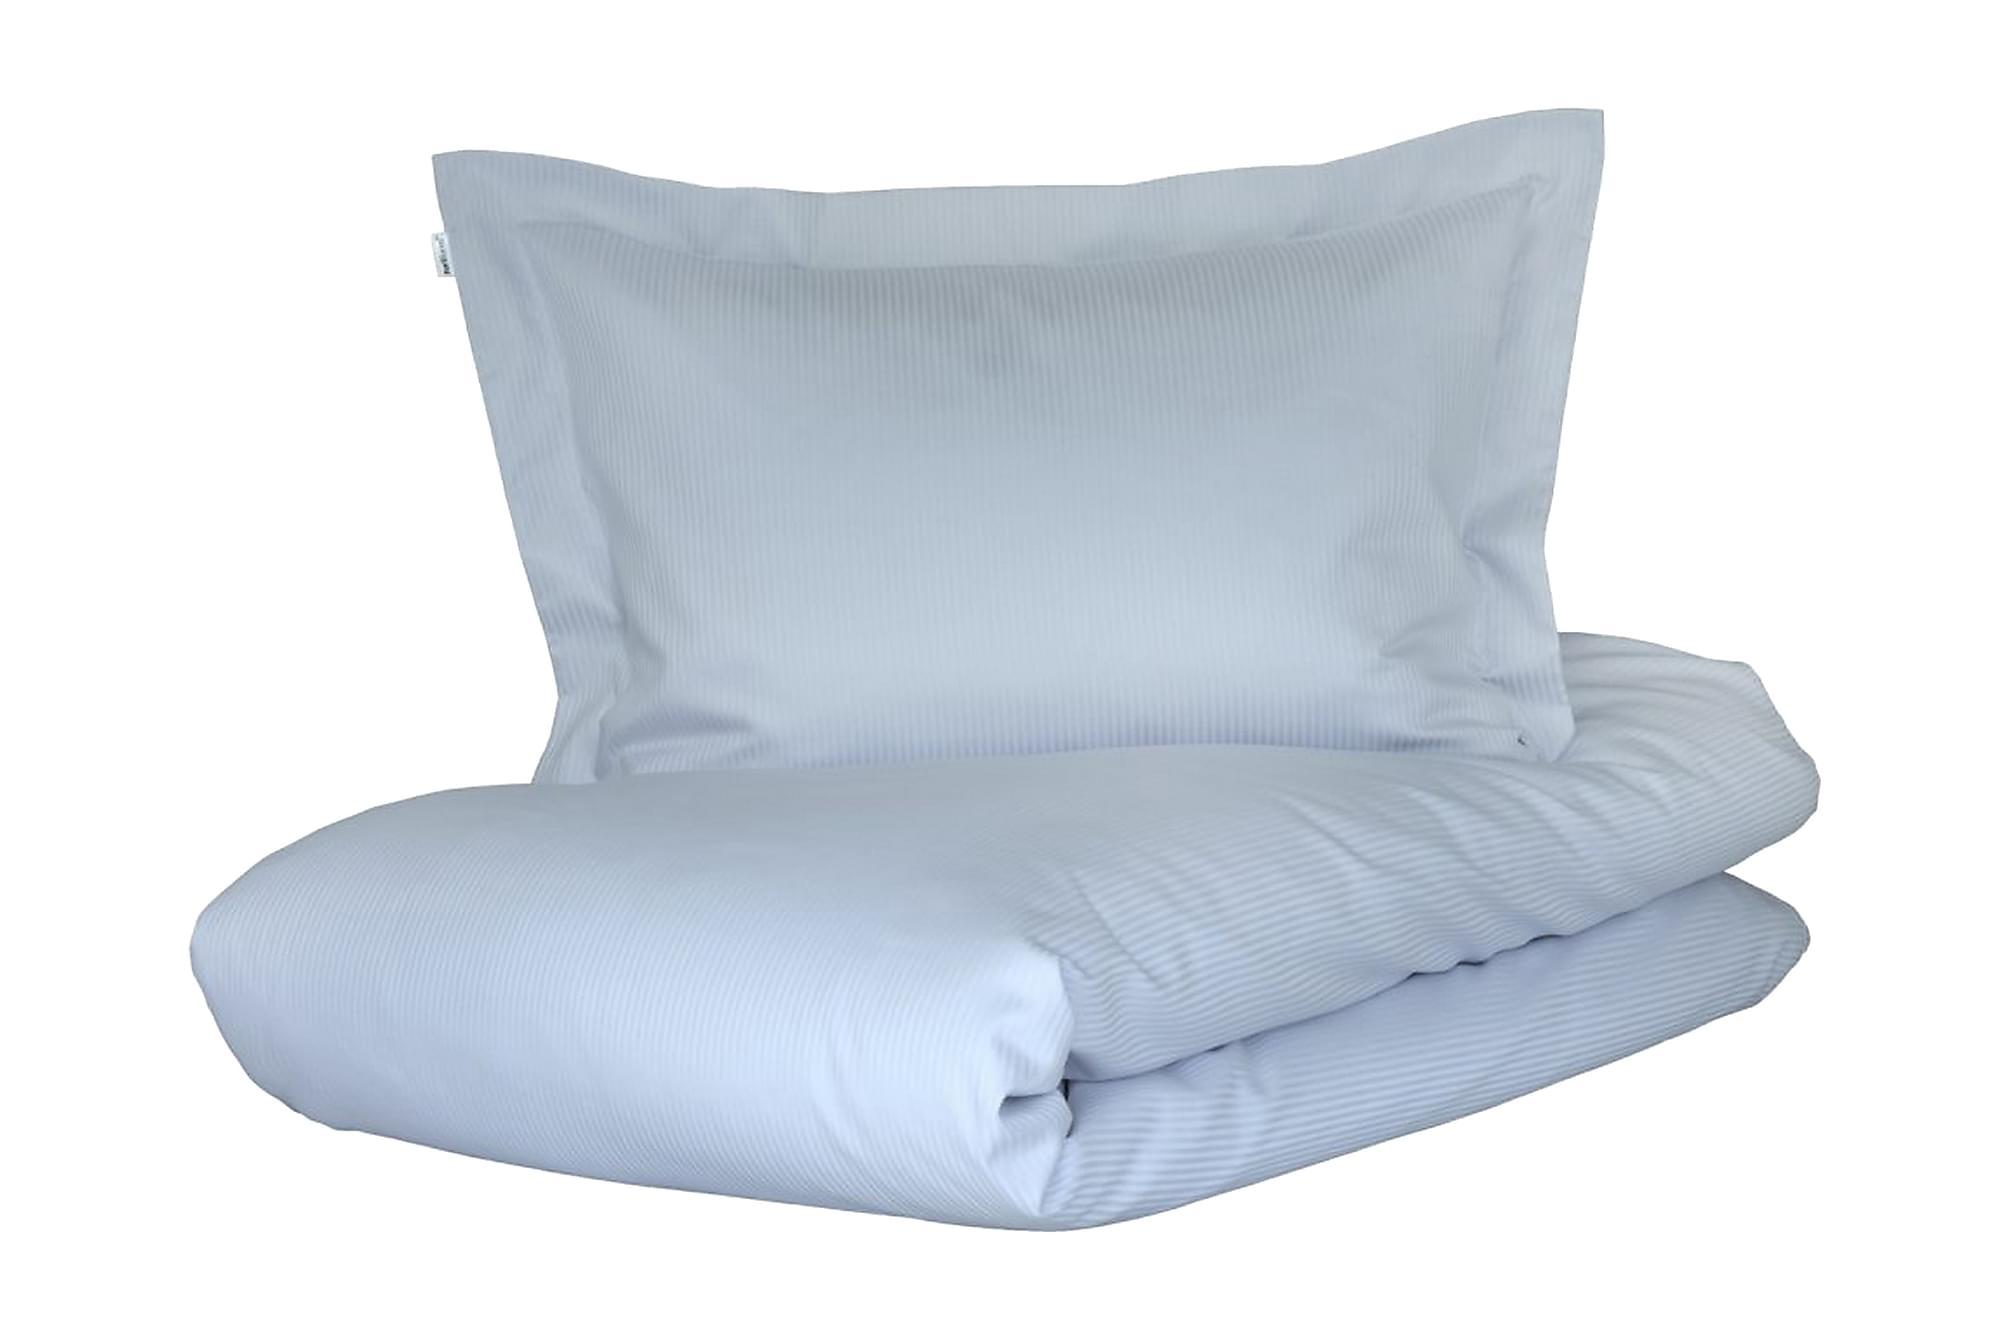 ALDERNEY Bäddset 150x210 cm Satin Ljusblå, Sängkläder